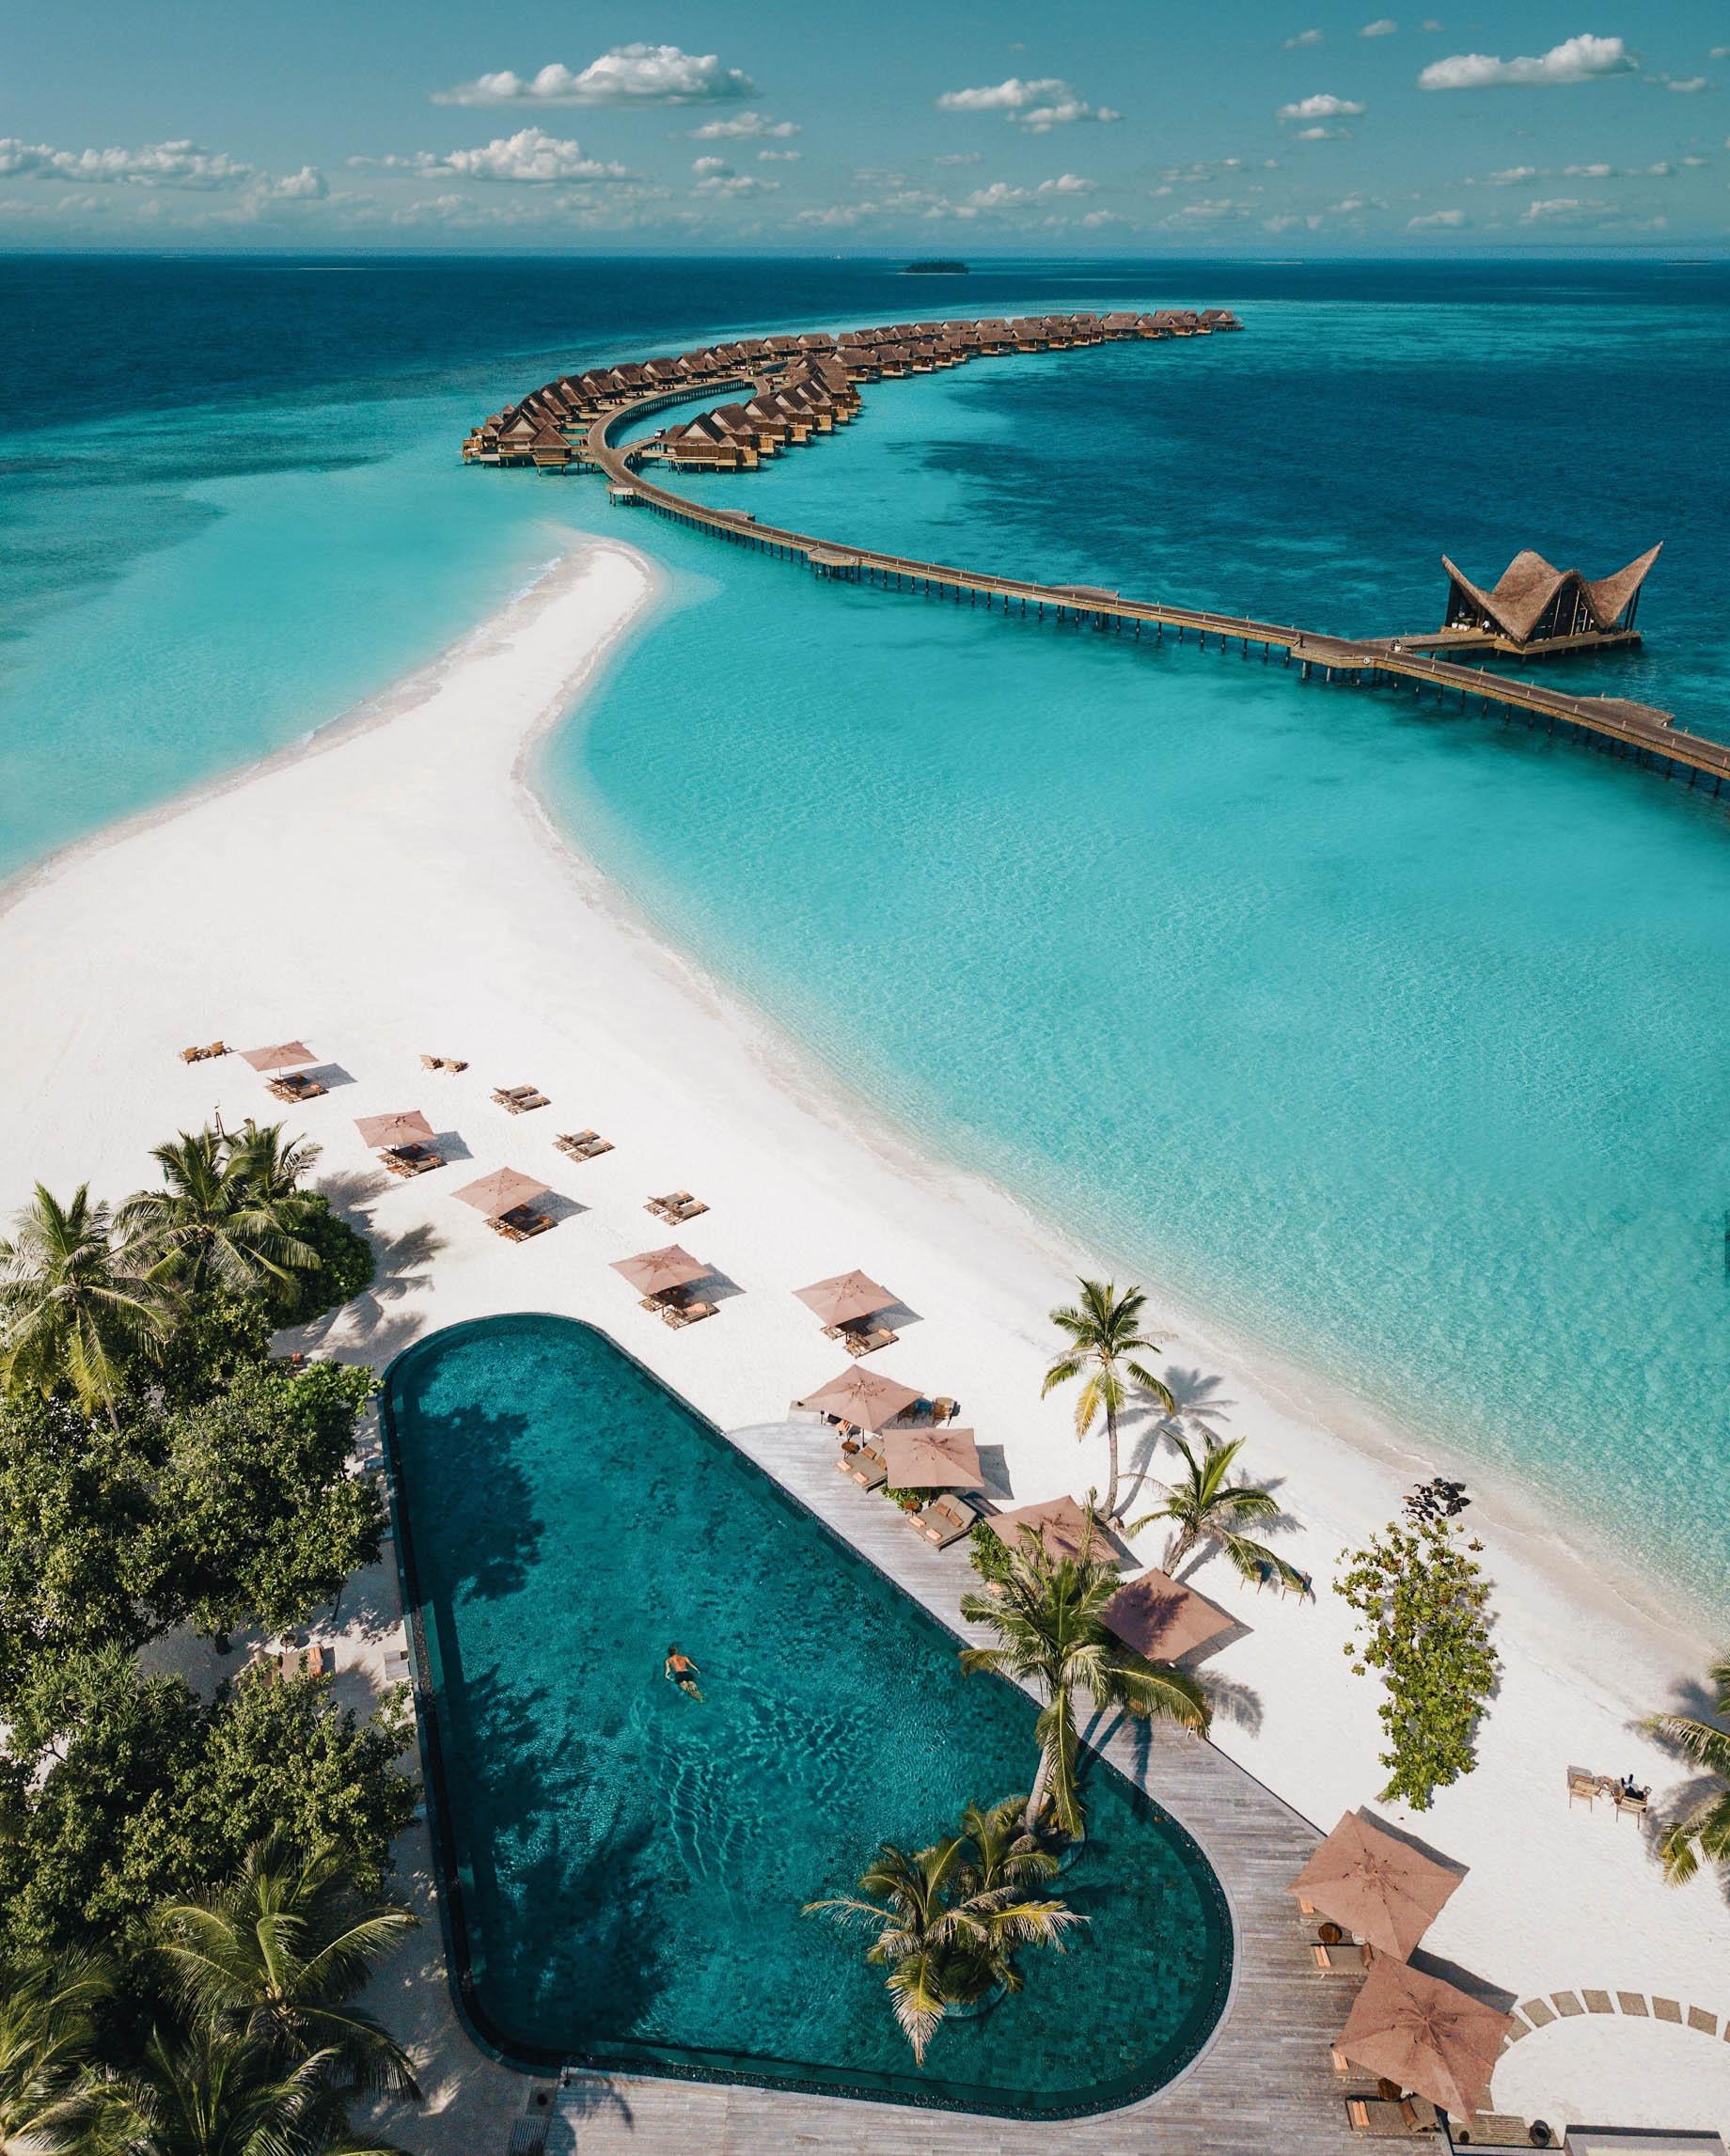 Joali Maldives Luxury Resort - Muravandhoo Island, Maldives - White Sand Beach Pool Aerial